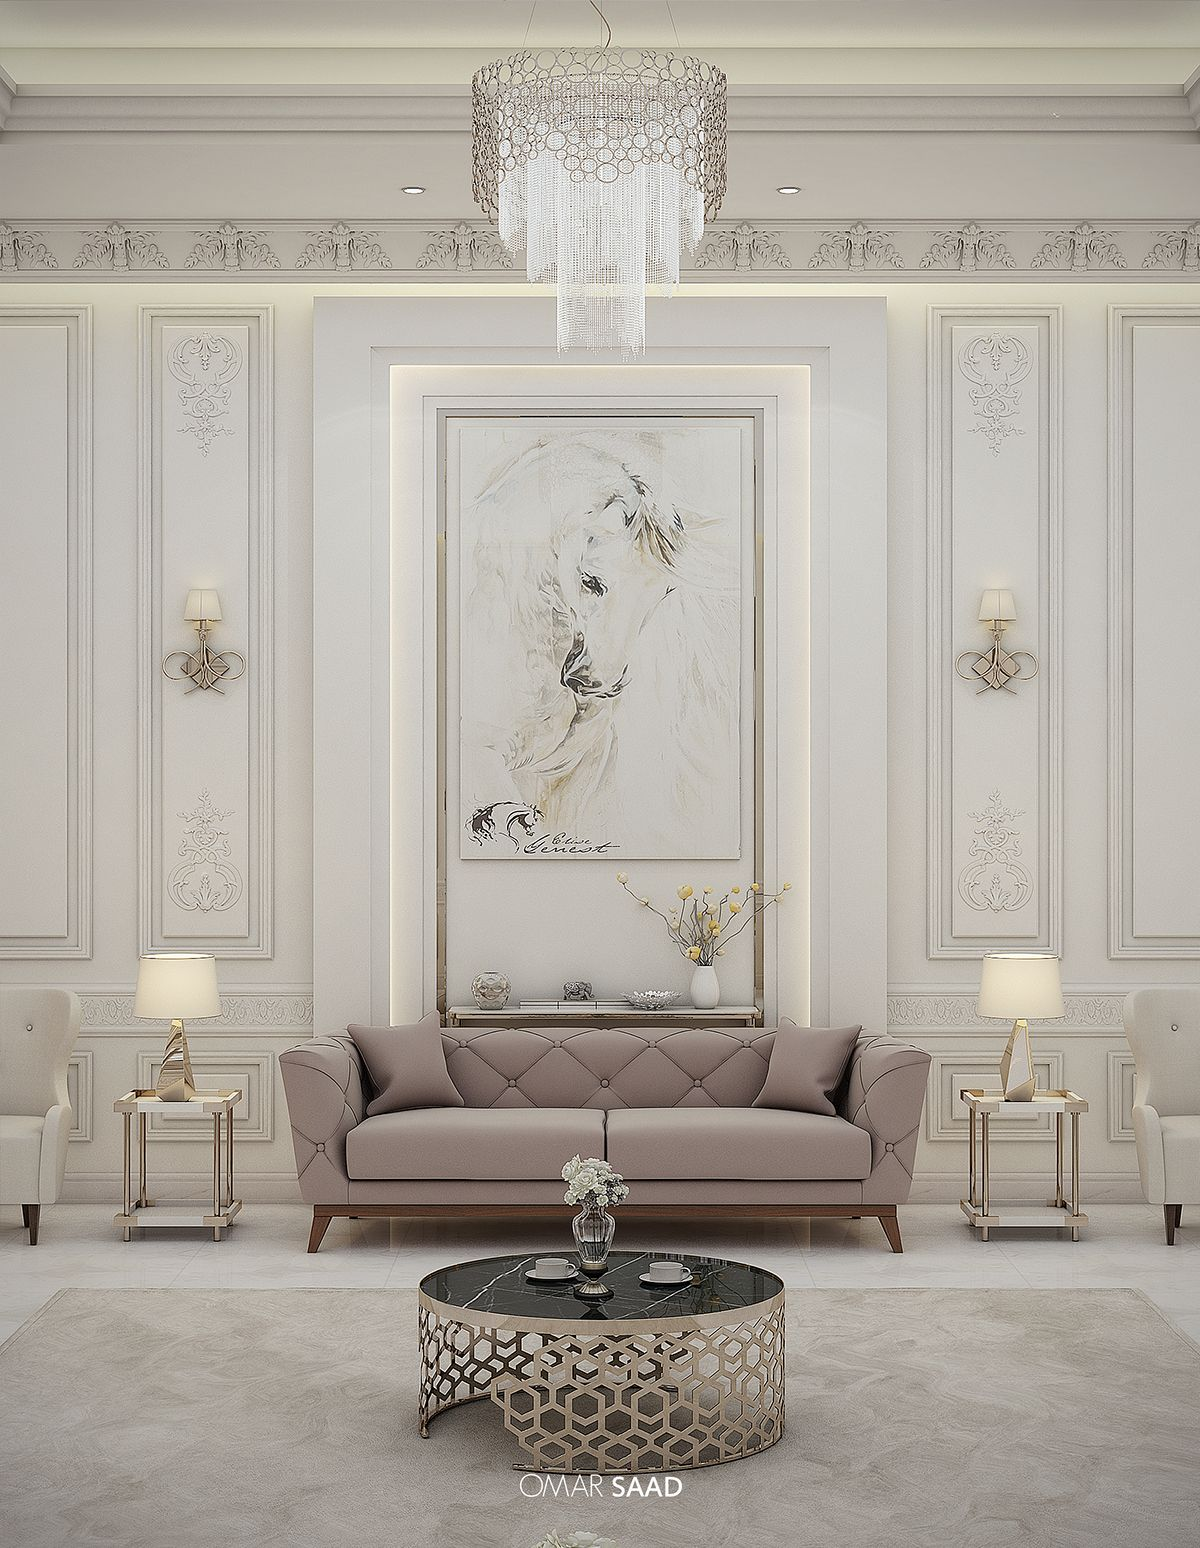 Luxury classic villa interior design on behance post for Classic interieur design